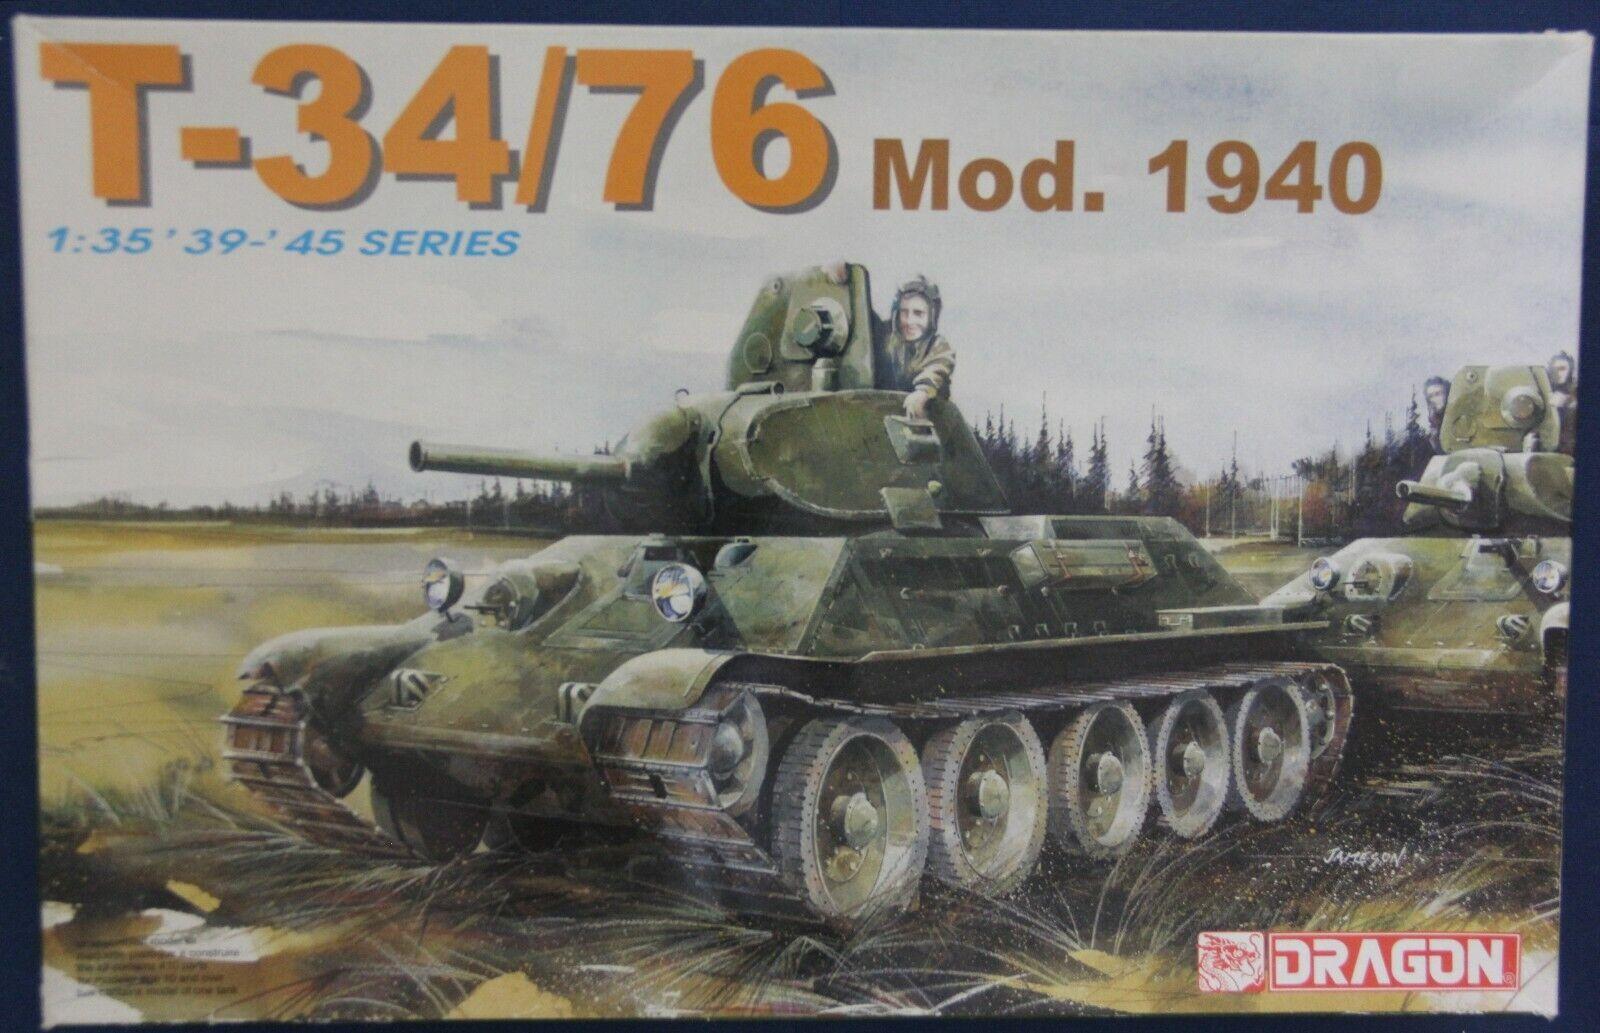 Dragon 6092 1 35 WWII T-34 76 Mod.1940